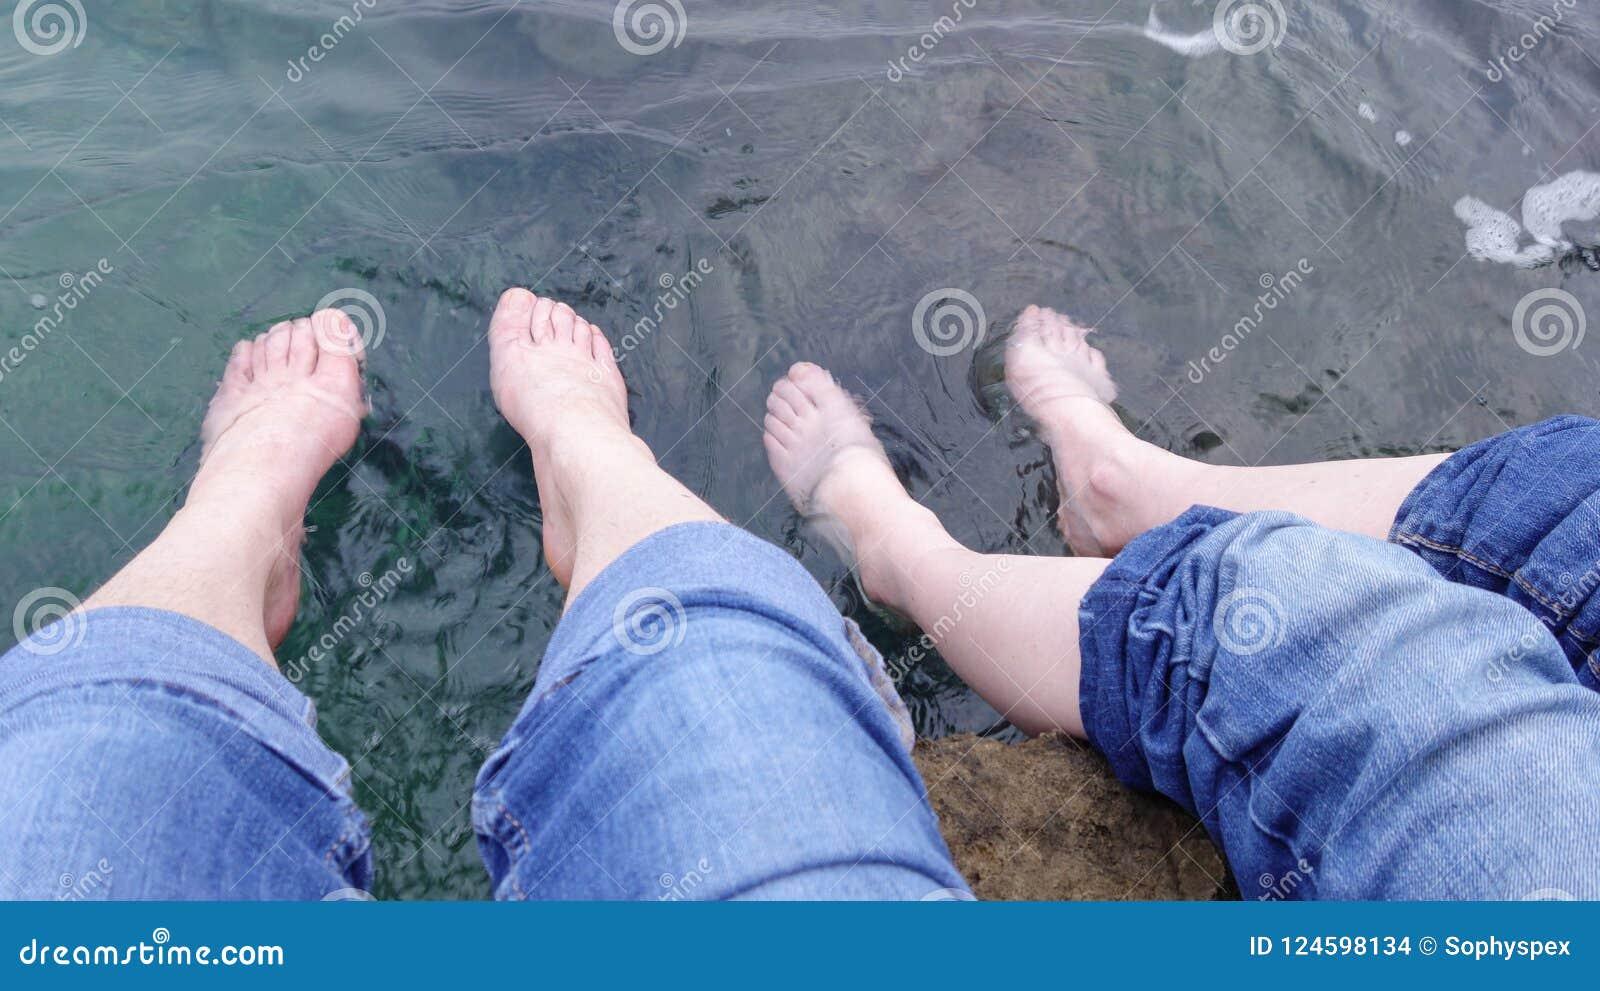 Two sets of feet paddling in the sea, Croatia